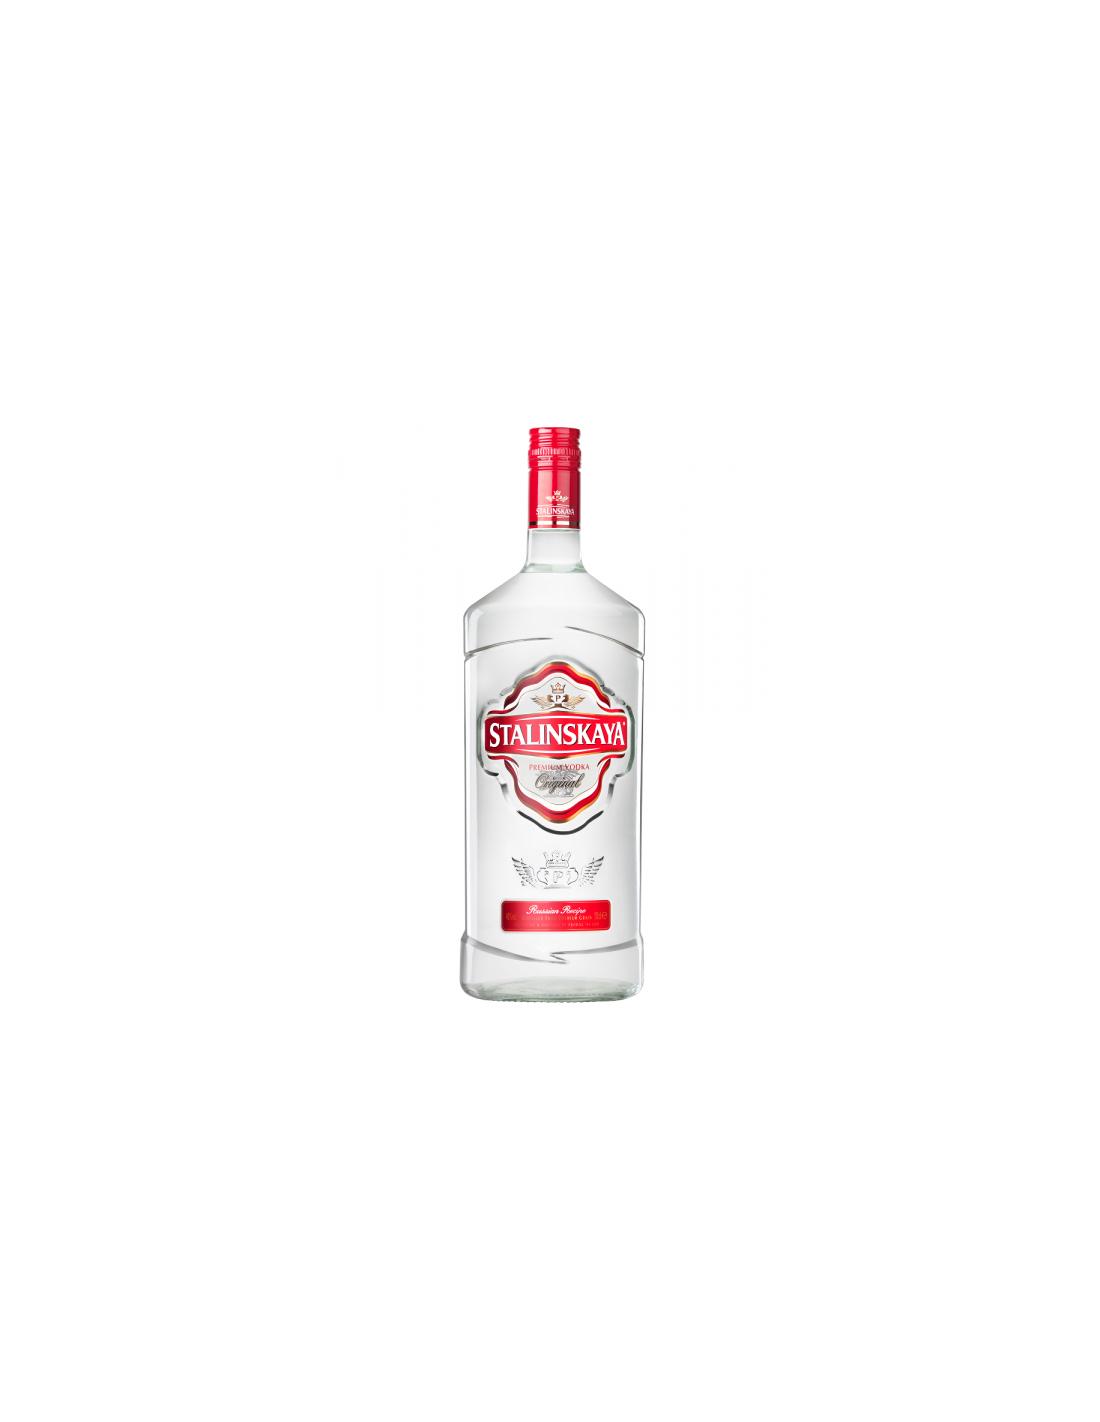 Vodca Salinskaya 1.75L, 40% alc., Romania